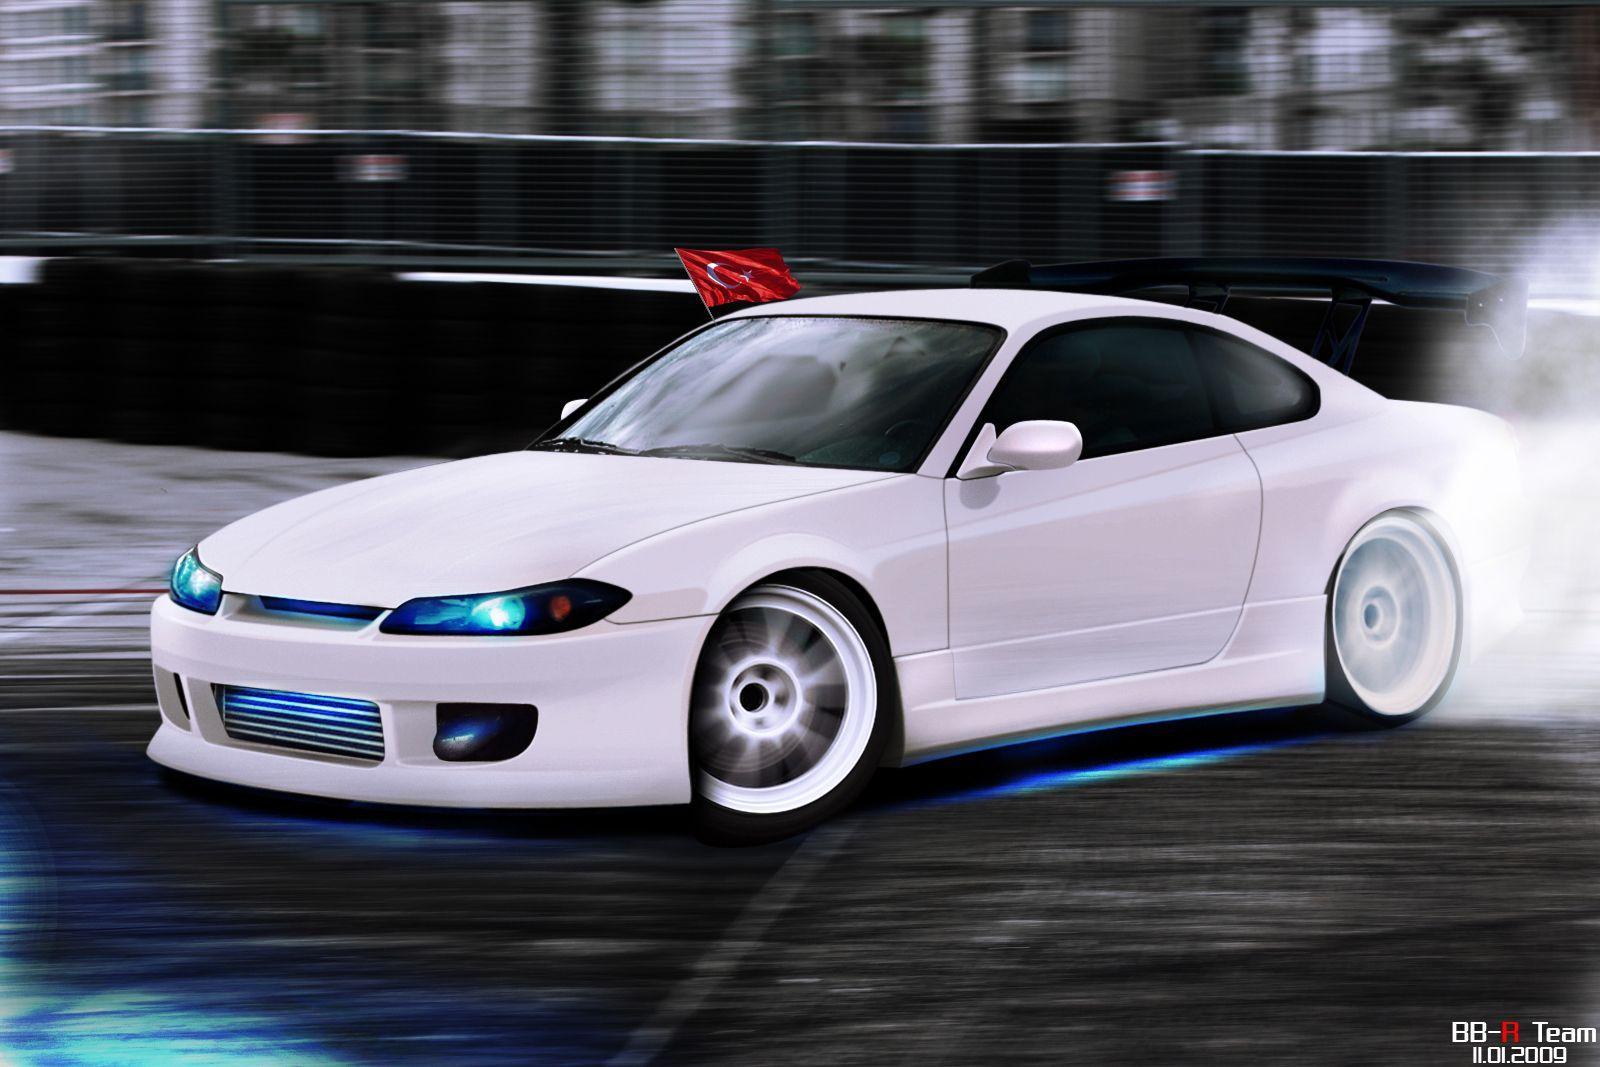 1600x1200px #902229 Nissan Silvia S15 (319.4 KB) | 24.07.2015 | By